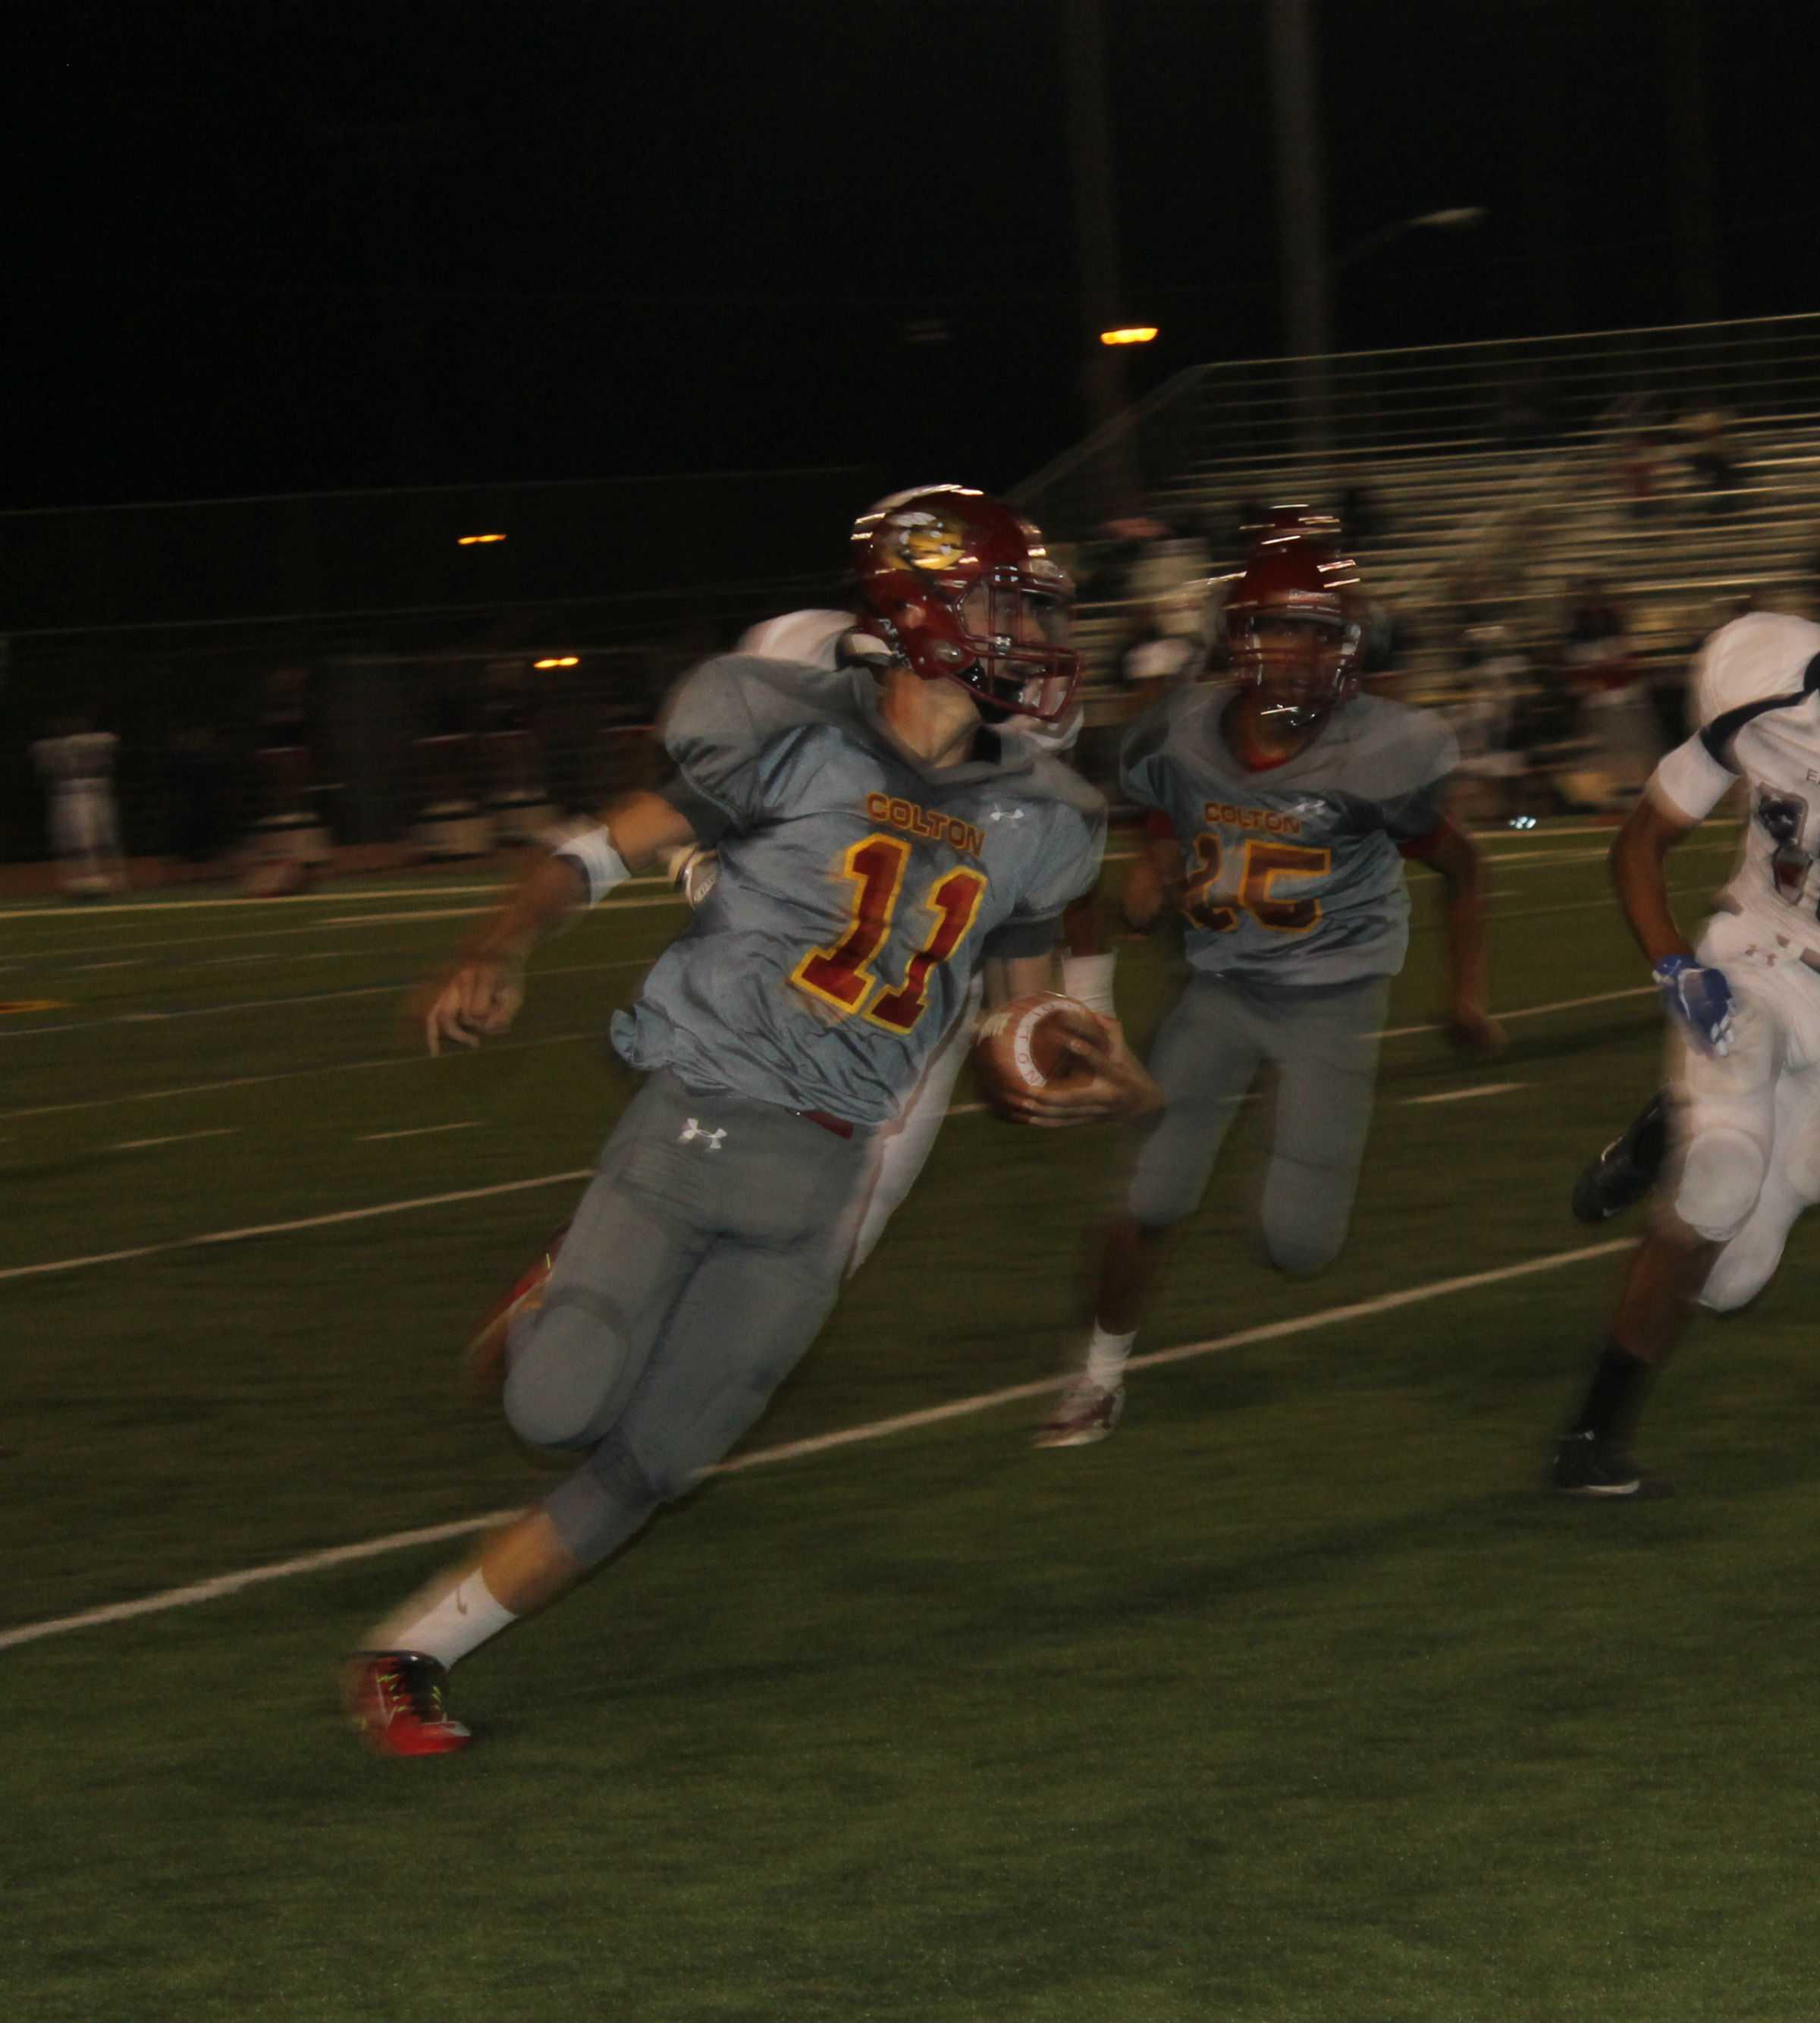 Sophomore running back Brennan Ramos, No. 11, turns the corner against La Sierra.